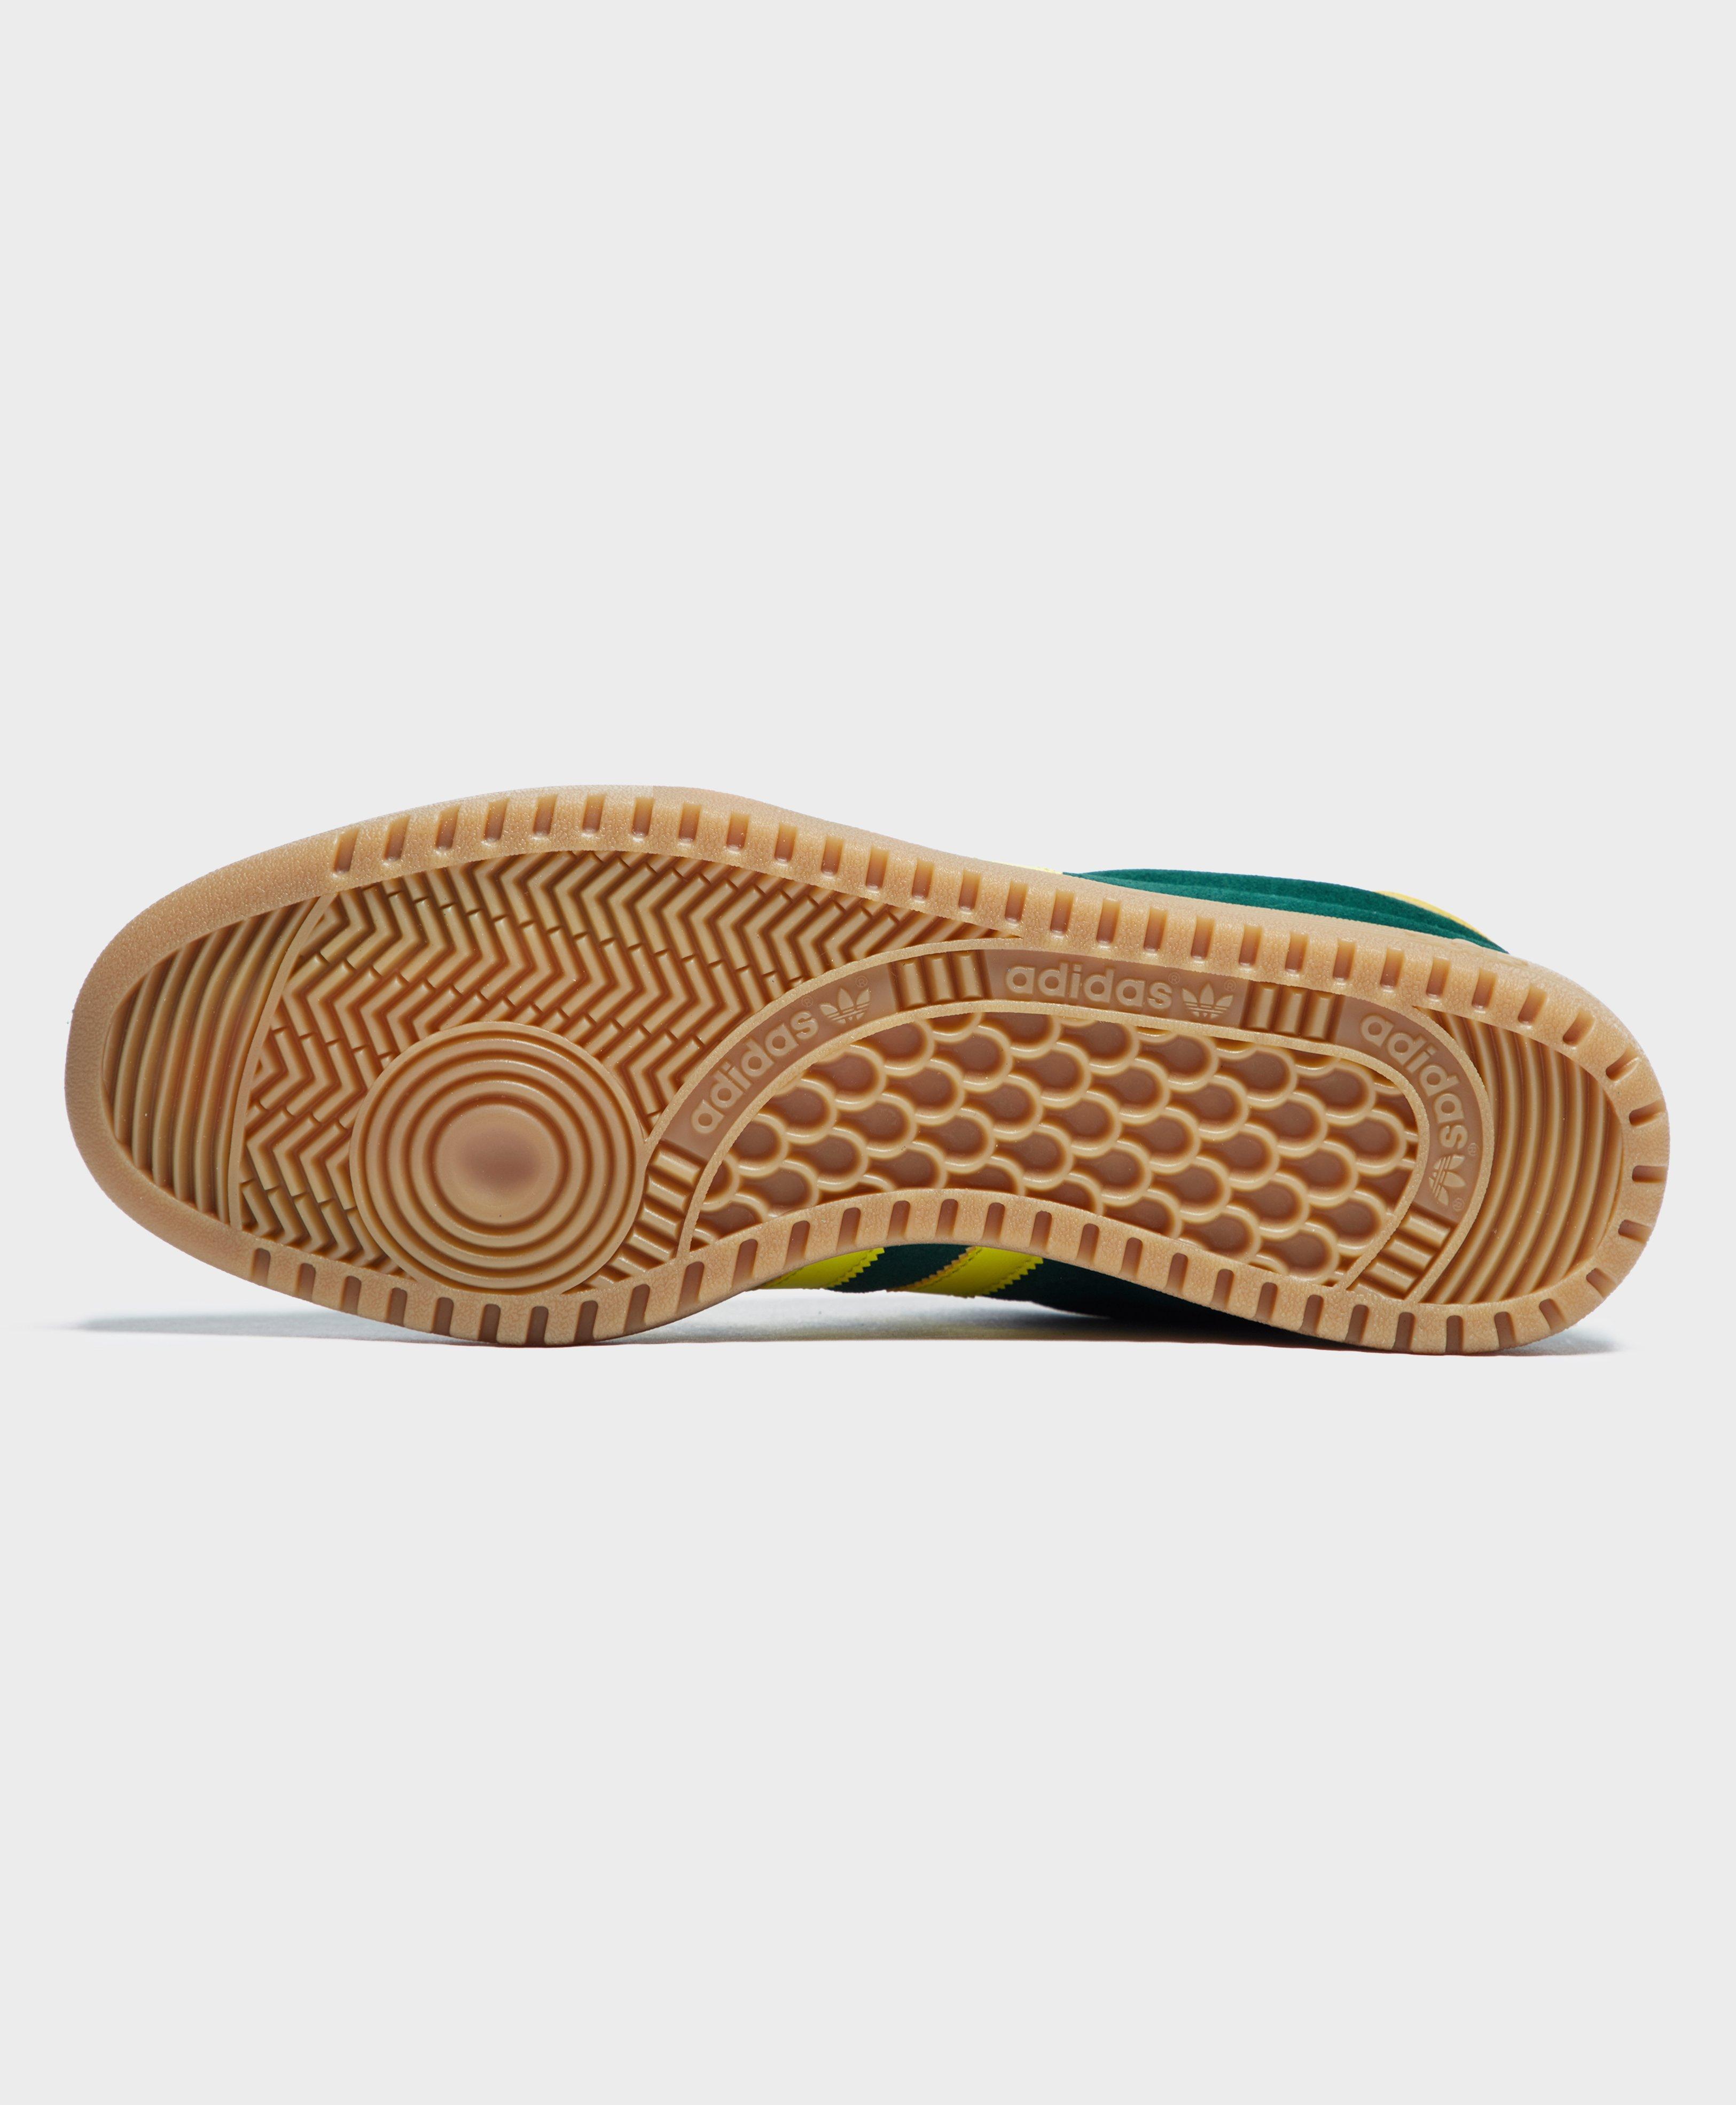 Lyst - Adidas Originals Bermuda in Green for Men 6c598f39a